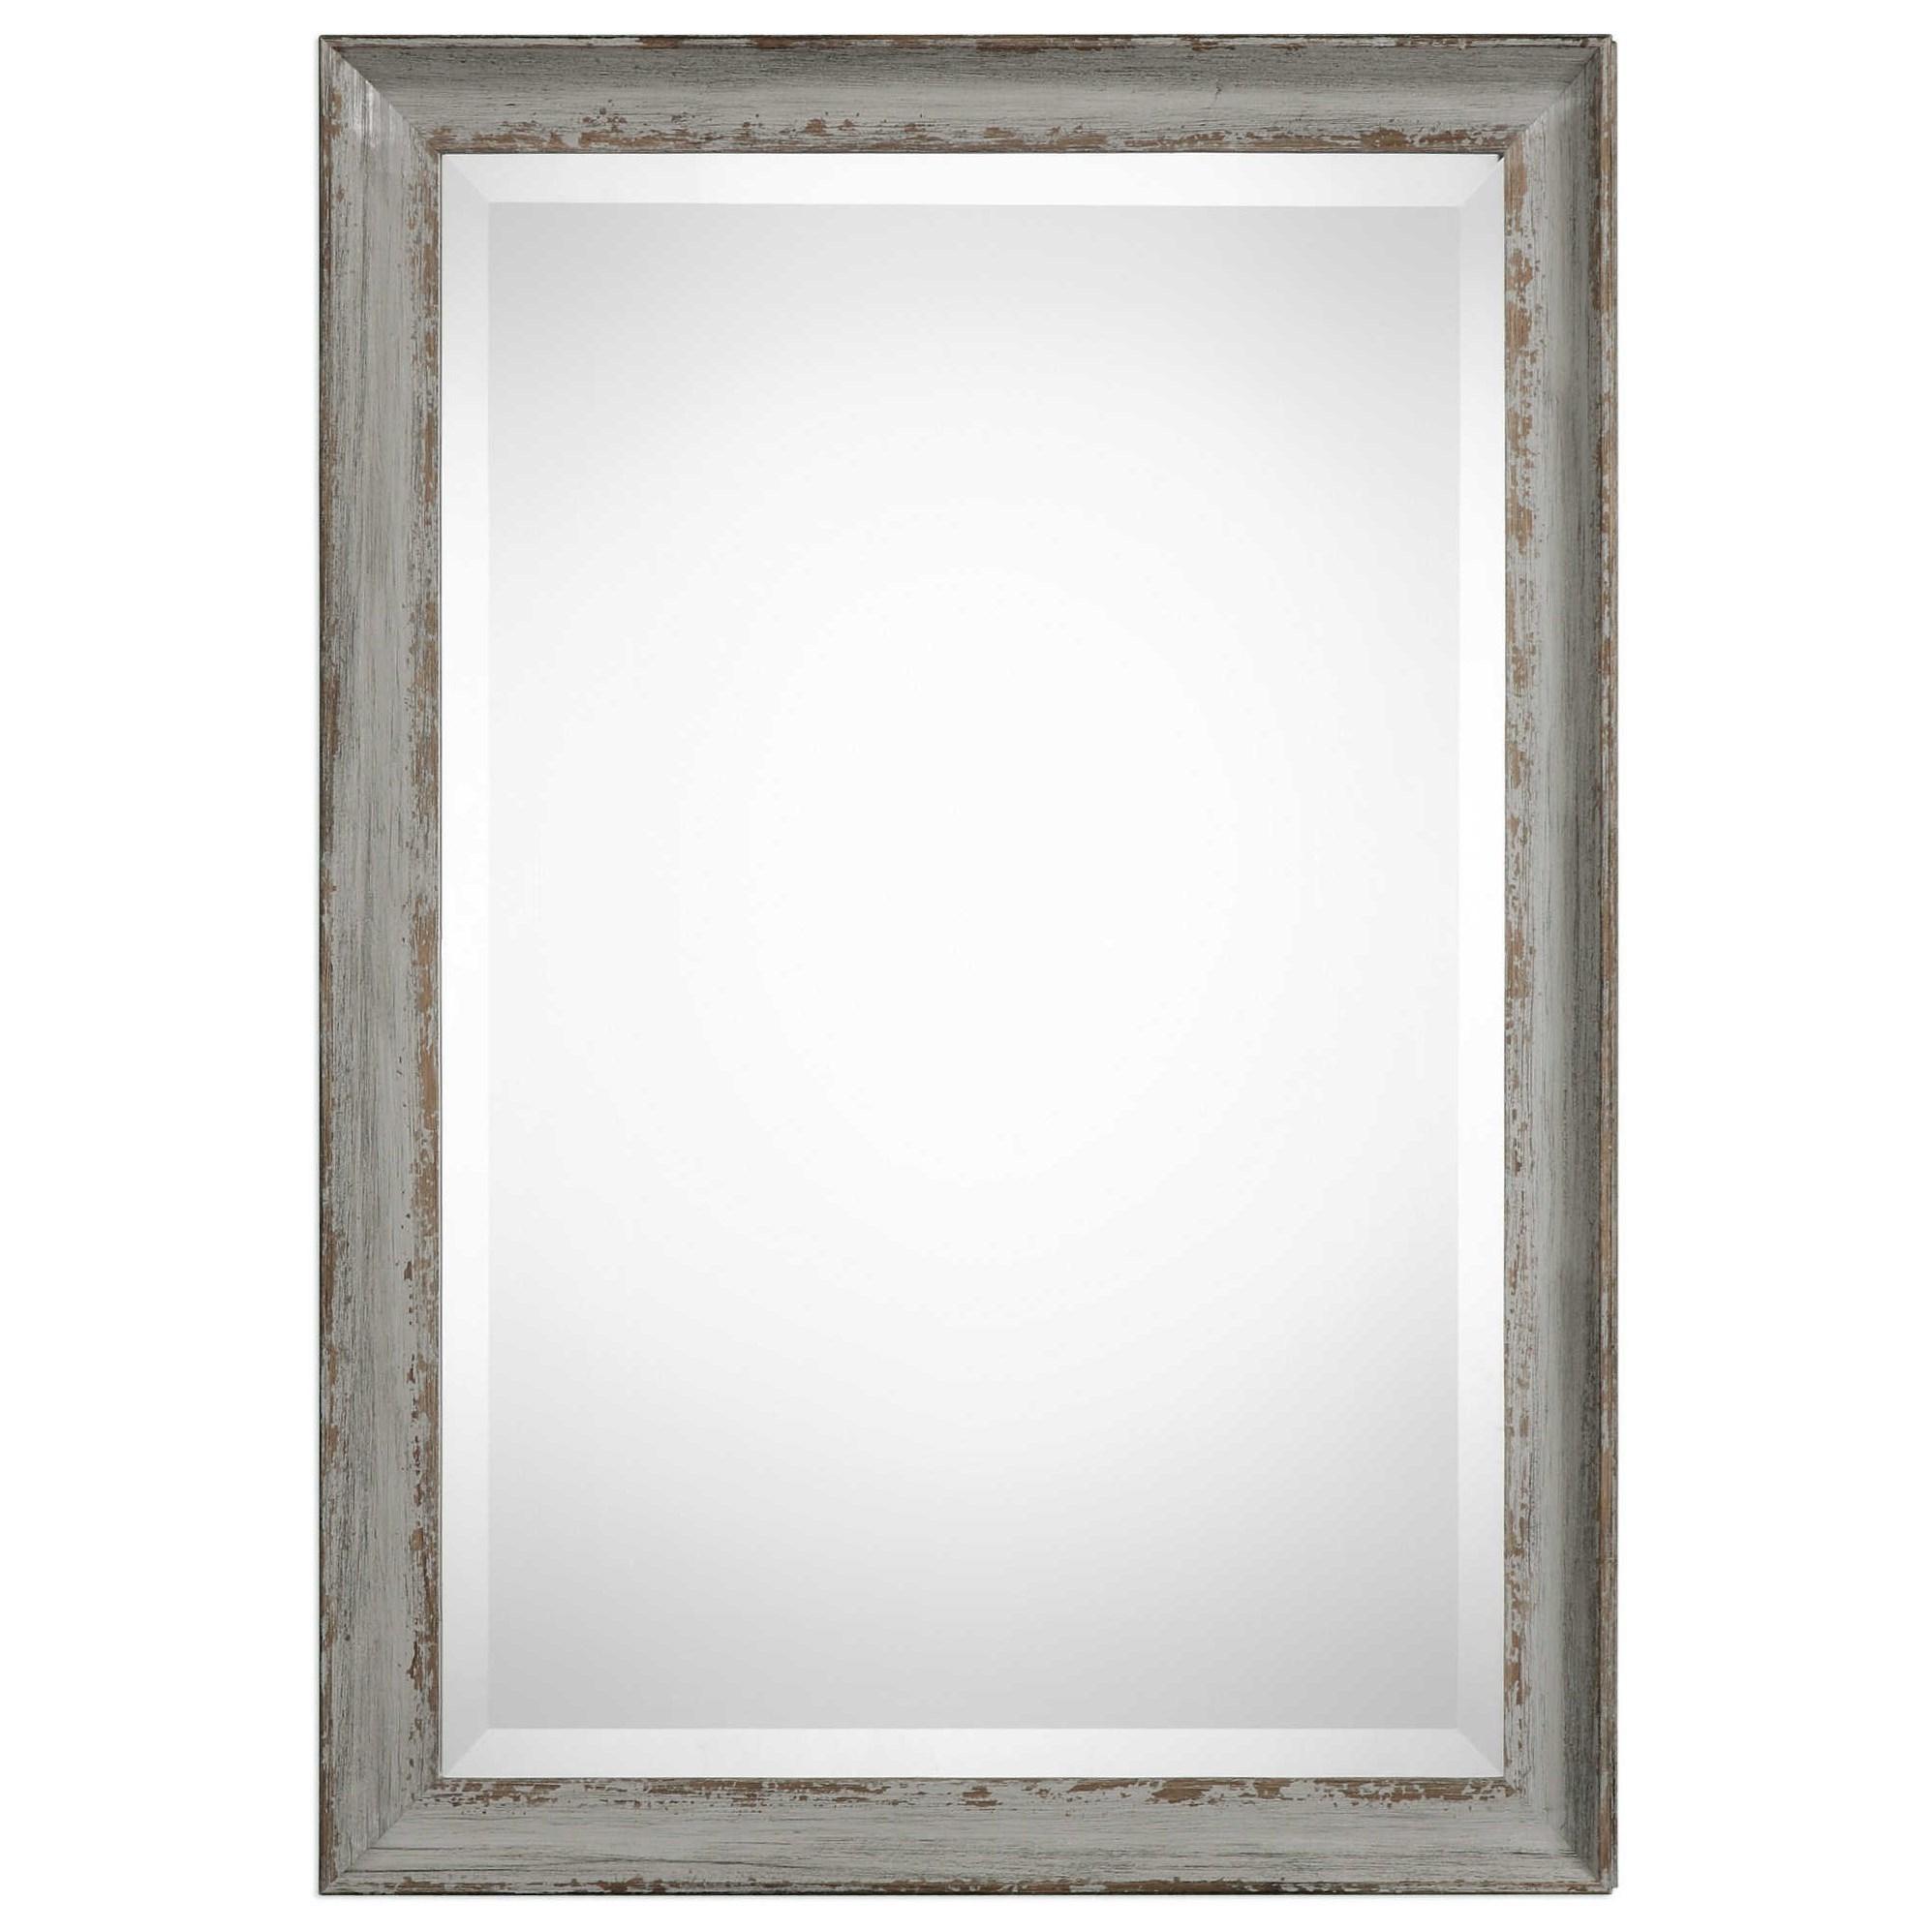 Uttermost Mirrors Hattie Aged Blue Mirror | Miskelly Furniture | Wall  Mirrors